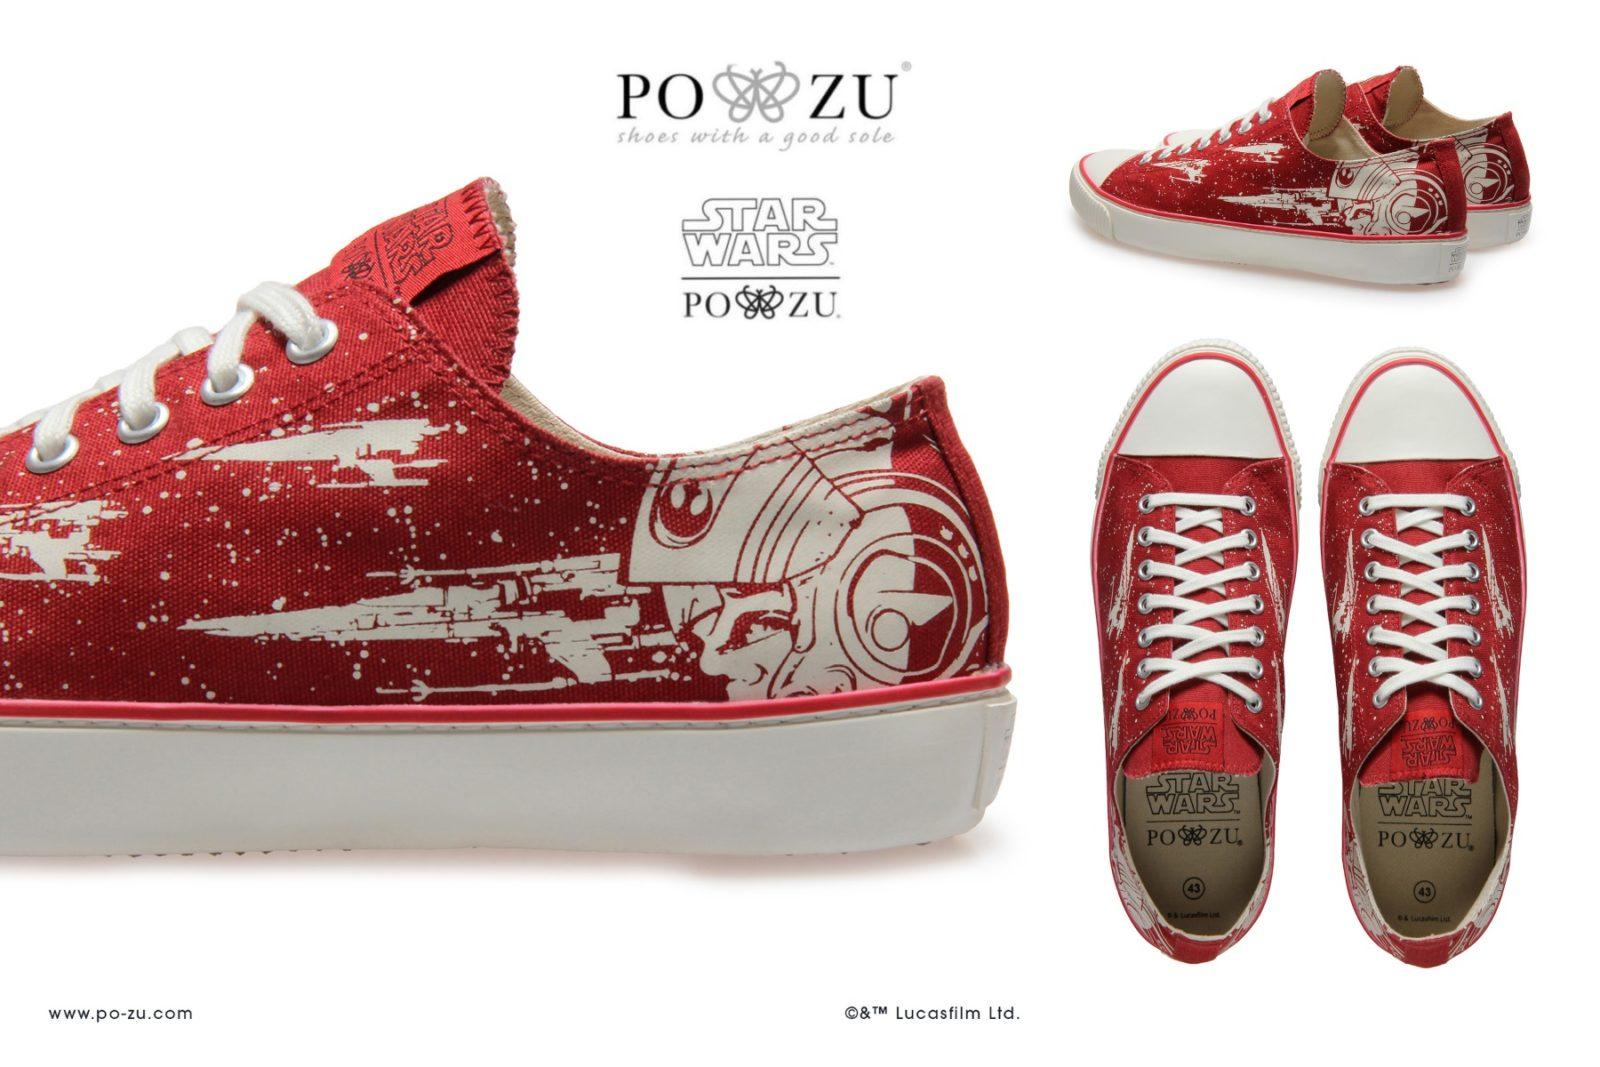 New Po-Zu Red X-Wing Women's Sneakers!